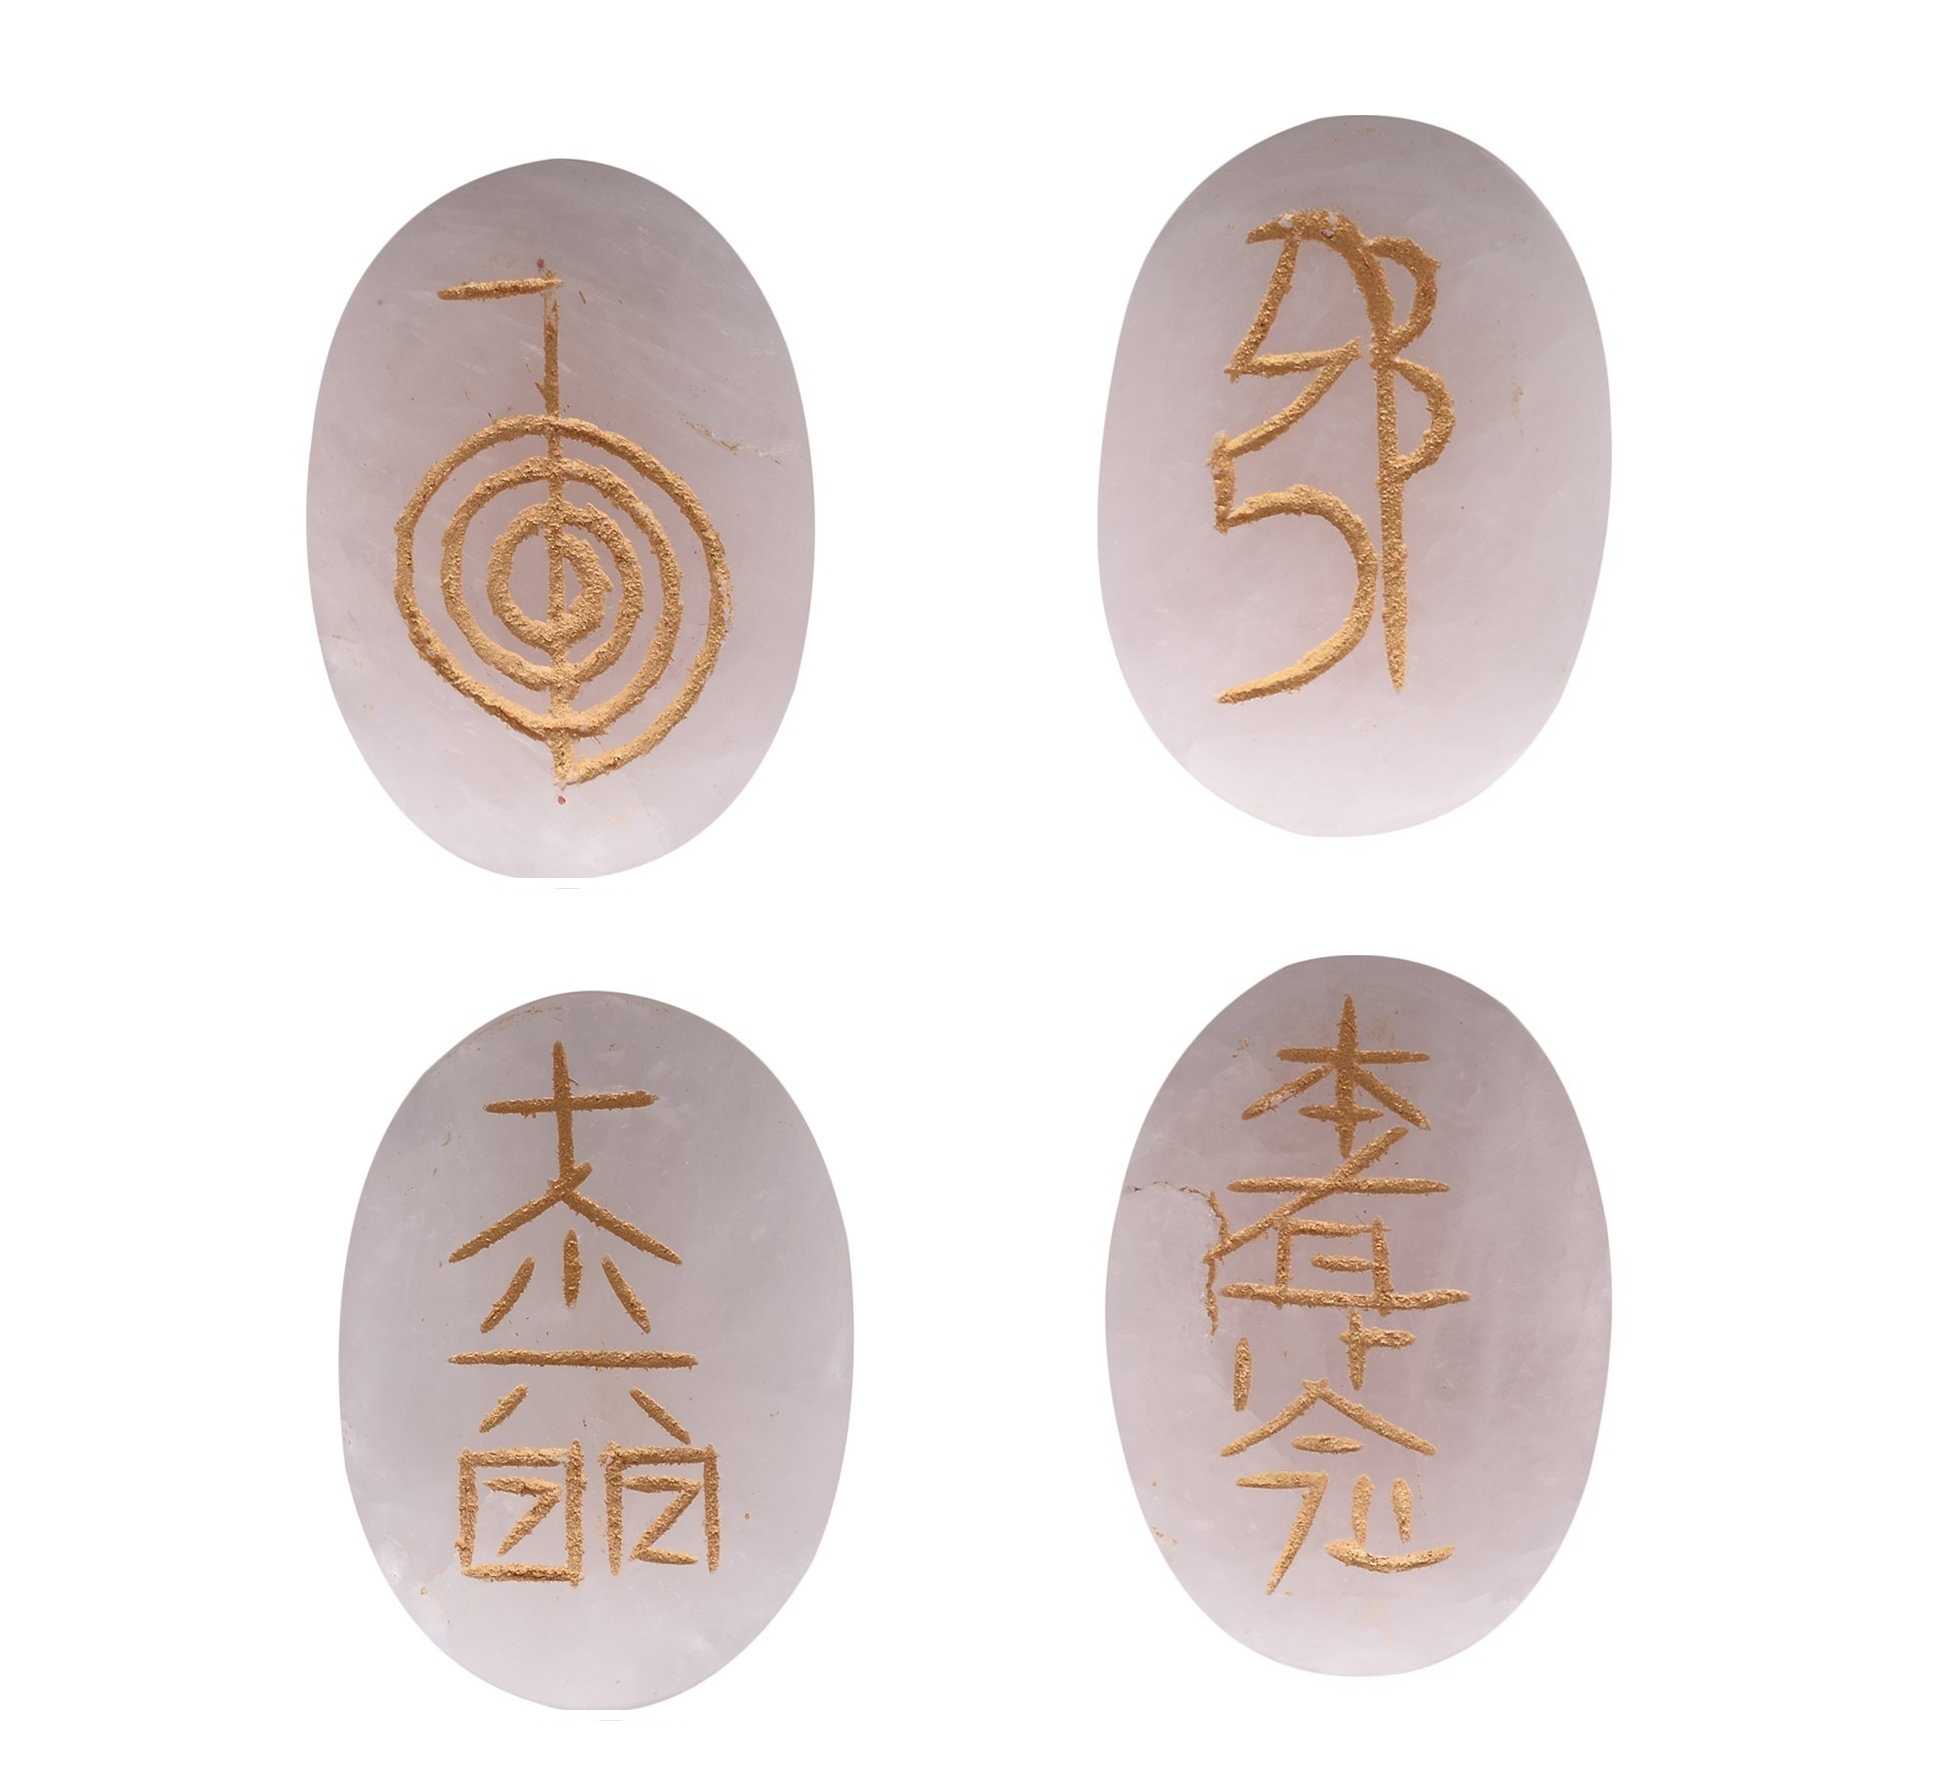 Crystals supply rose quartz usui reiki symbols set rose quartz usui reiki symbols set biocorpaavc